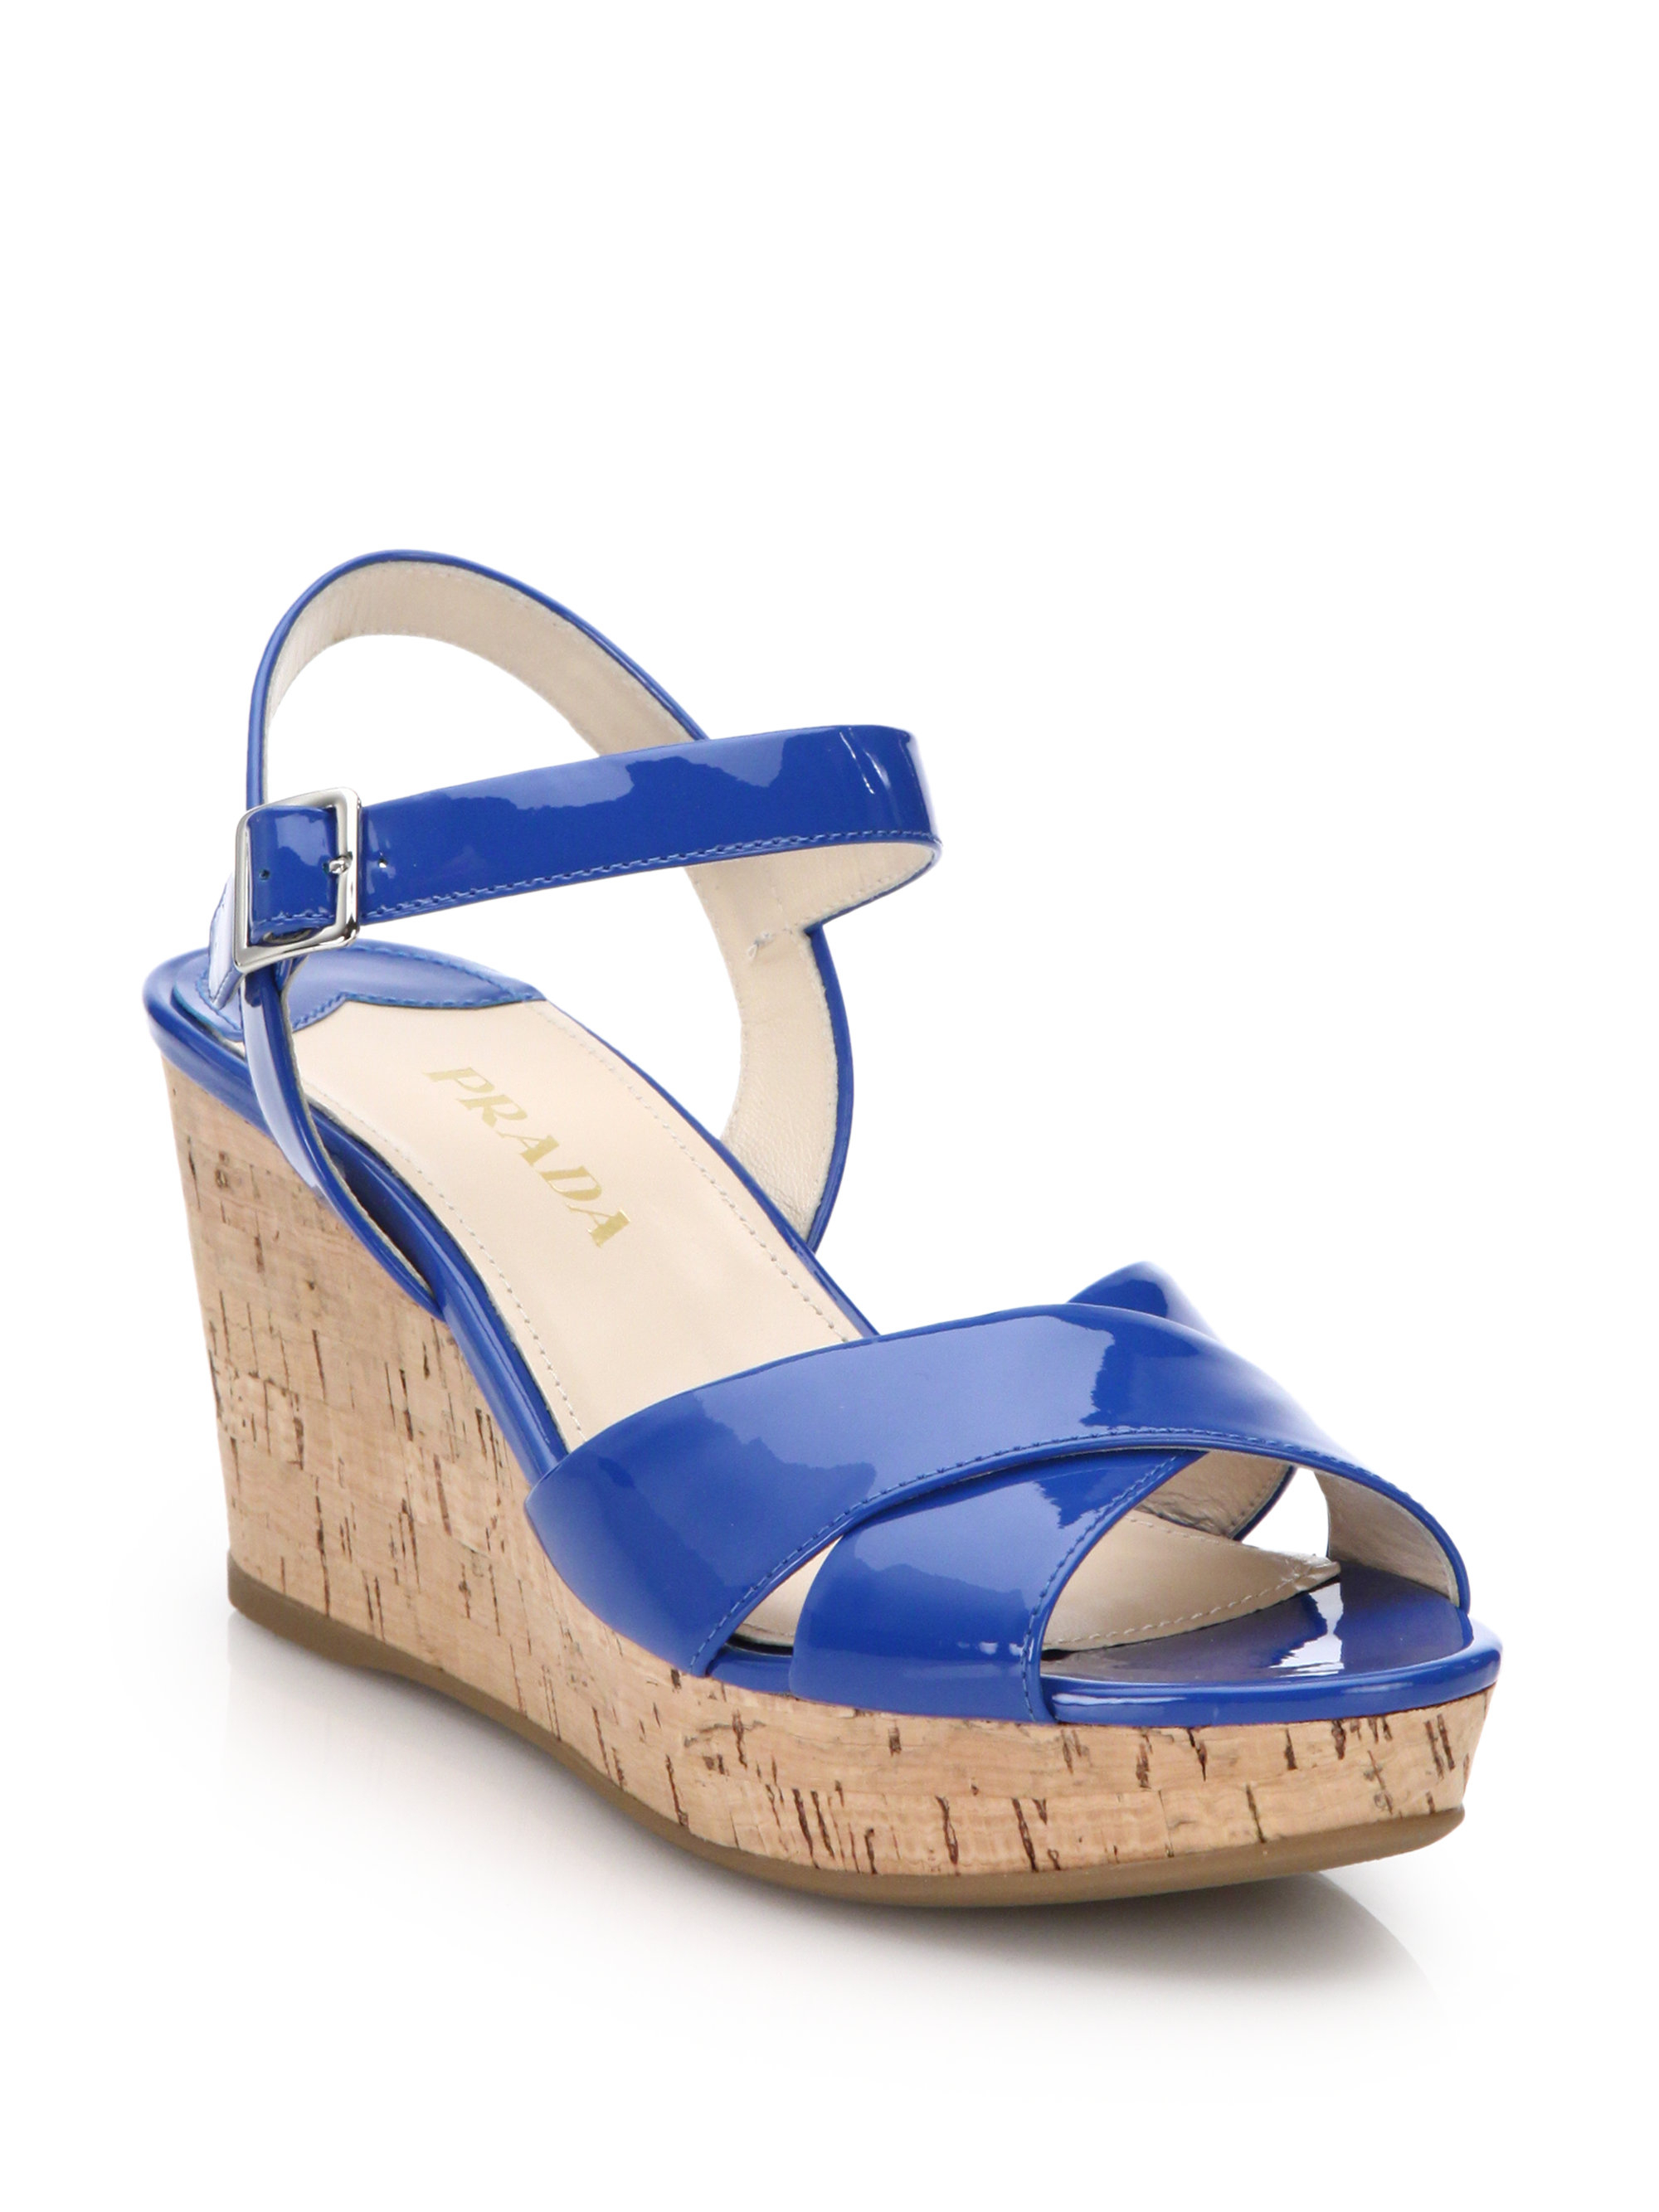 def71062d49 Lyst - Prada Cork-wedge Patent Leather Sandals in Blue